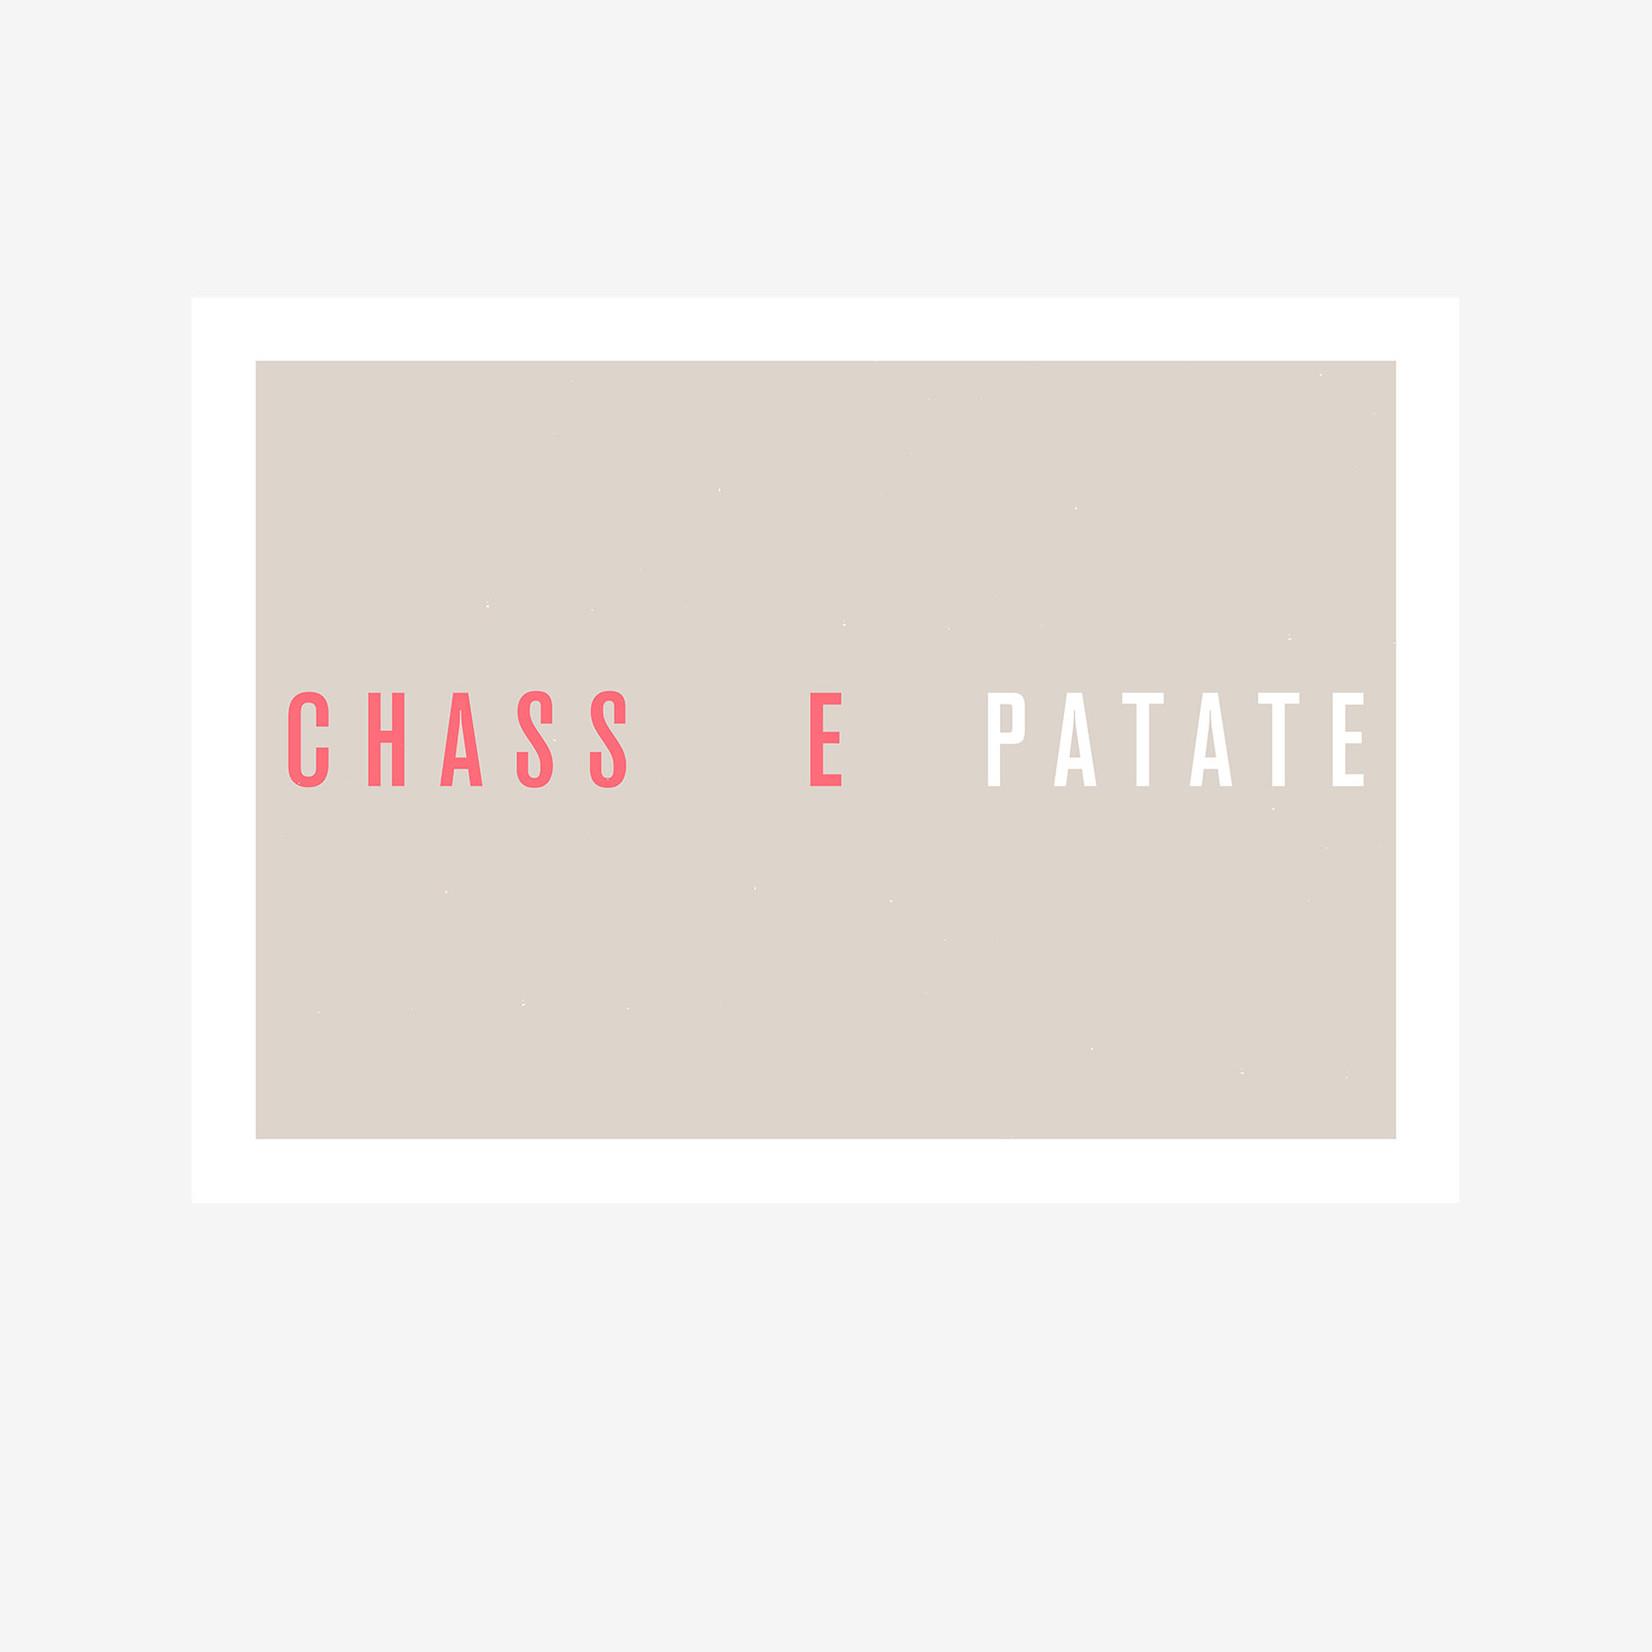 Poster 'Chasse Patate' (Maison du Peloton)